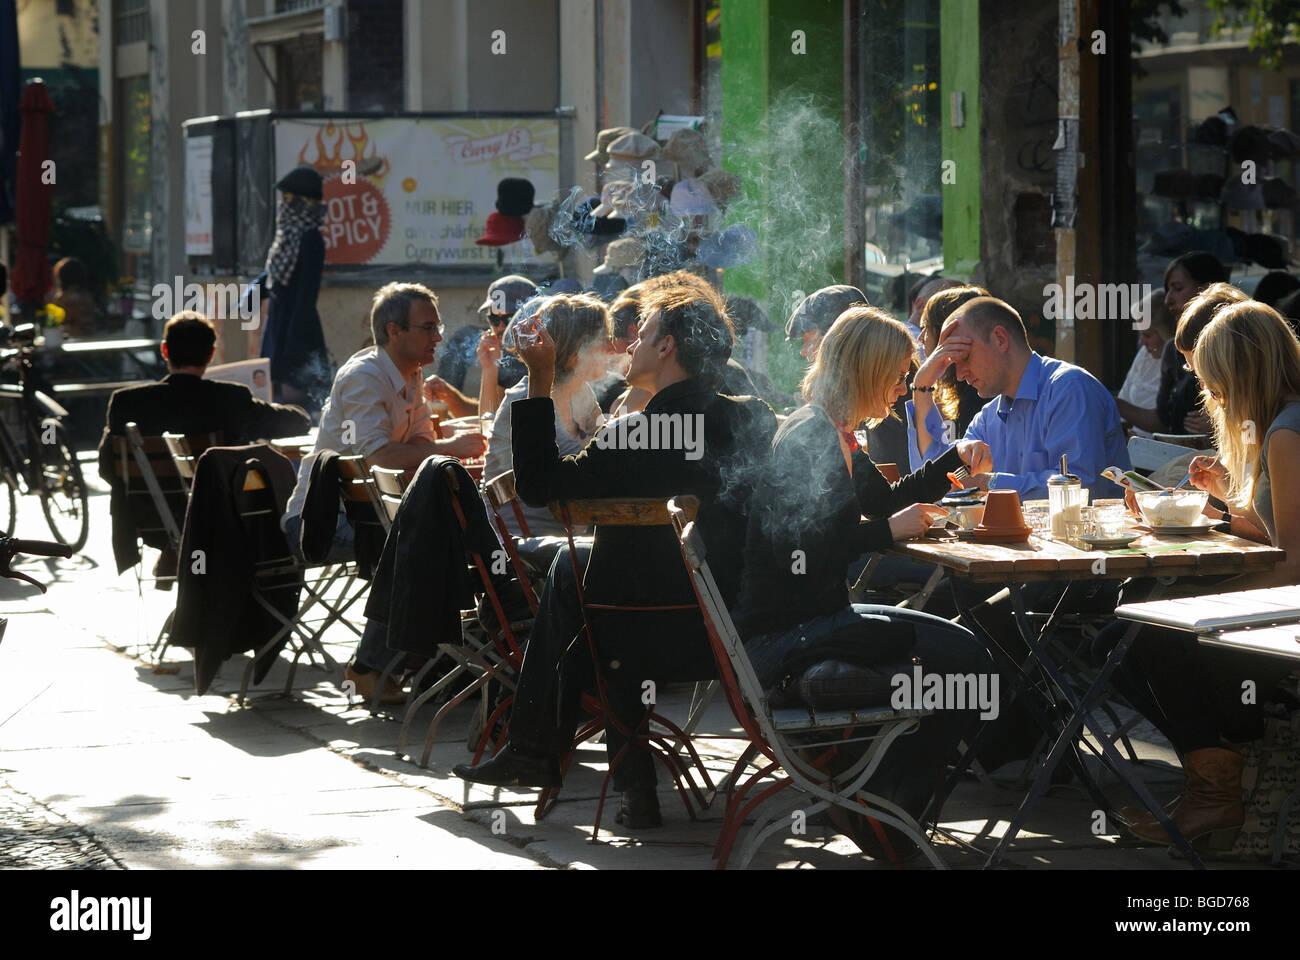 Typical Prenzlauer Berg street scene. Cafes, restaurants, passersby. Kastanienallee, Prenzlauer Berg district, Berlin, - Stock Image